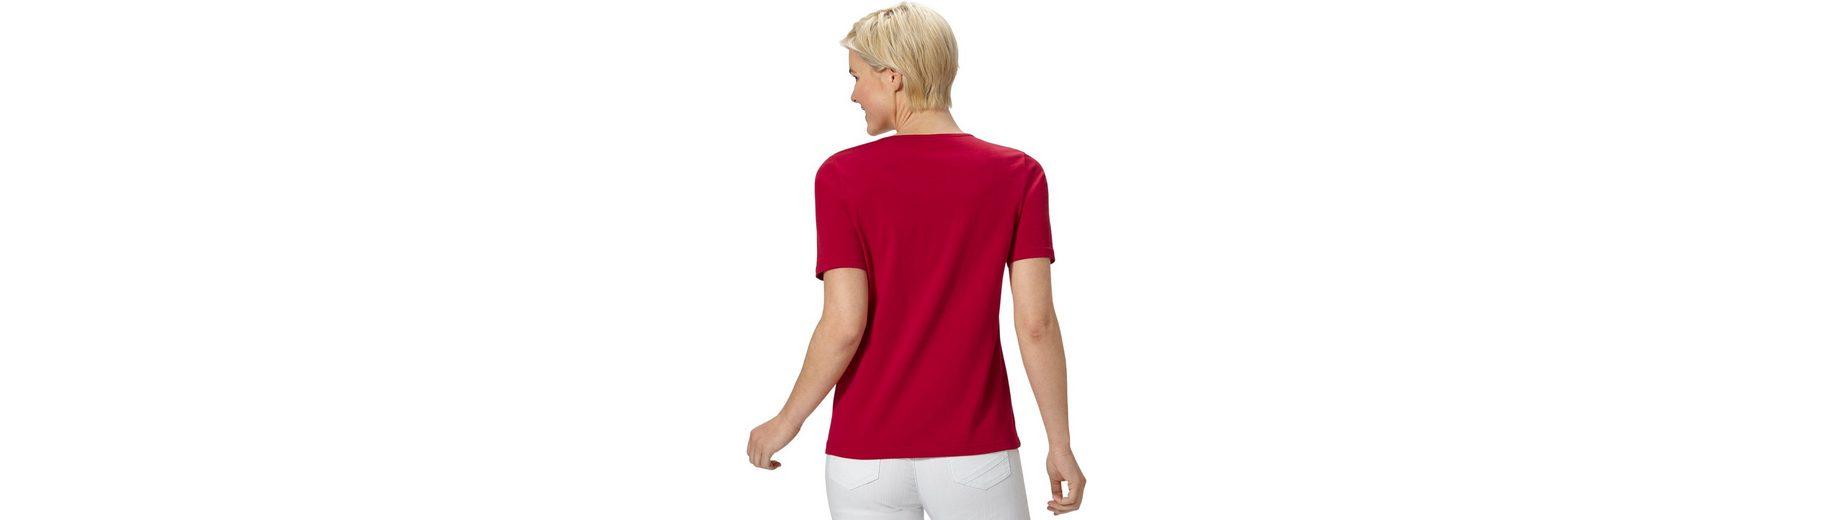 Classic Basics Shirt aus reiner Baumwolle Bestes Geschäft Zu Bekommen Online Sast Online Auslass Neue Ankunft 3OXQuav2g